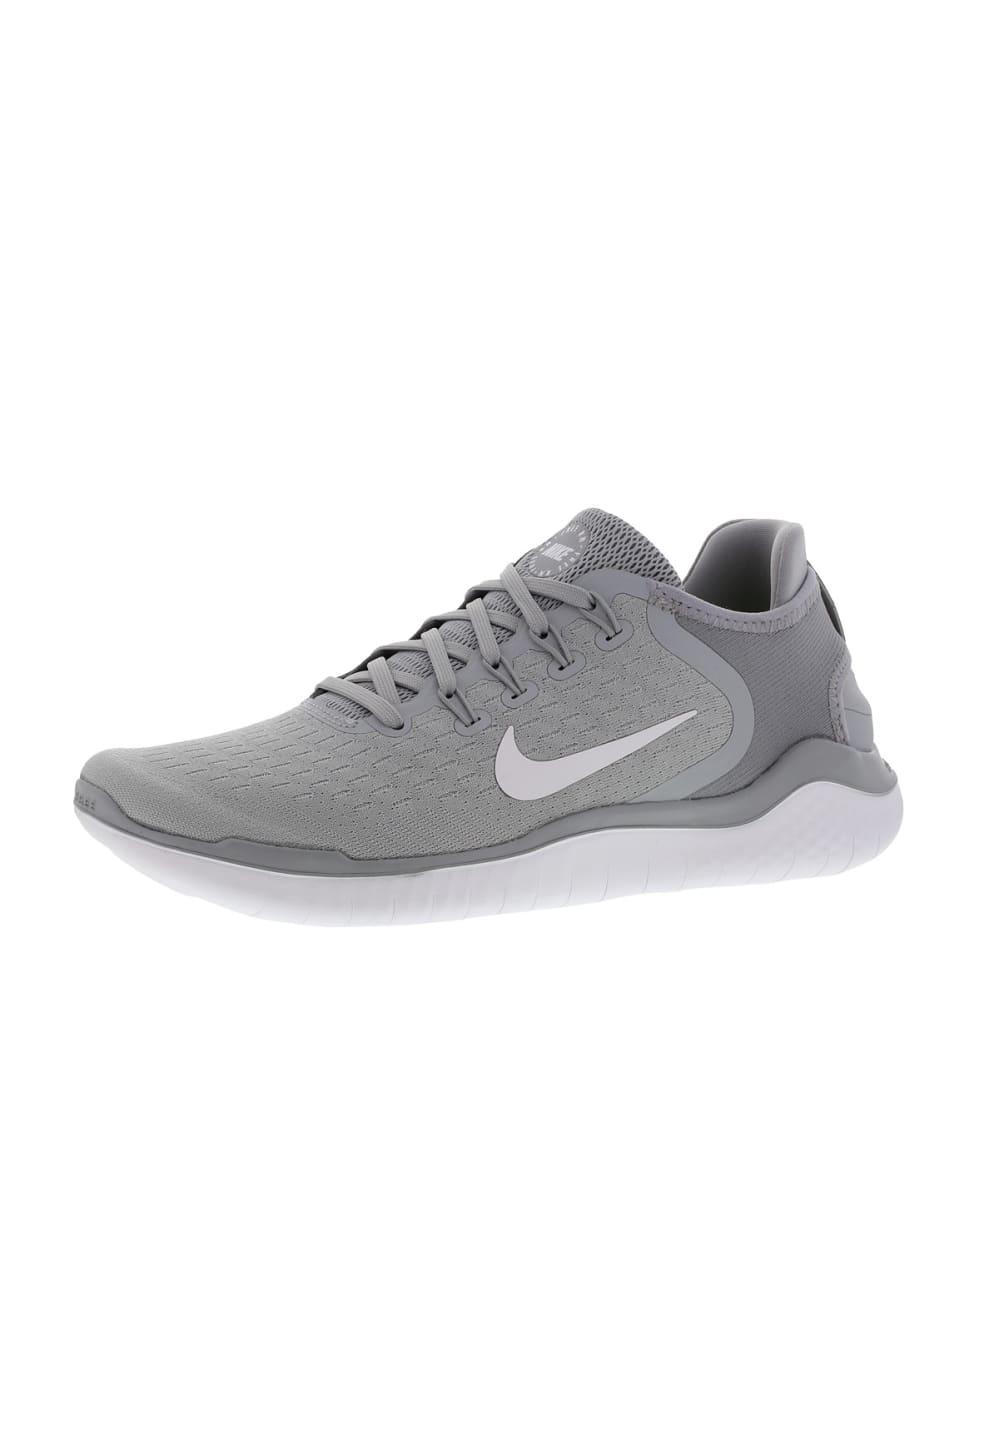 Nike Free RN 2018 - Laufschuhe für Damen - Grau